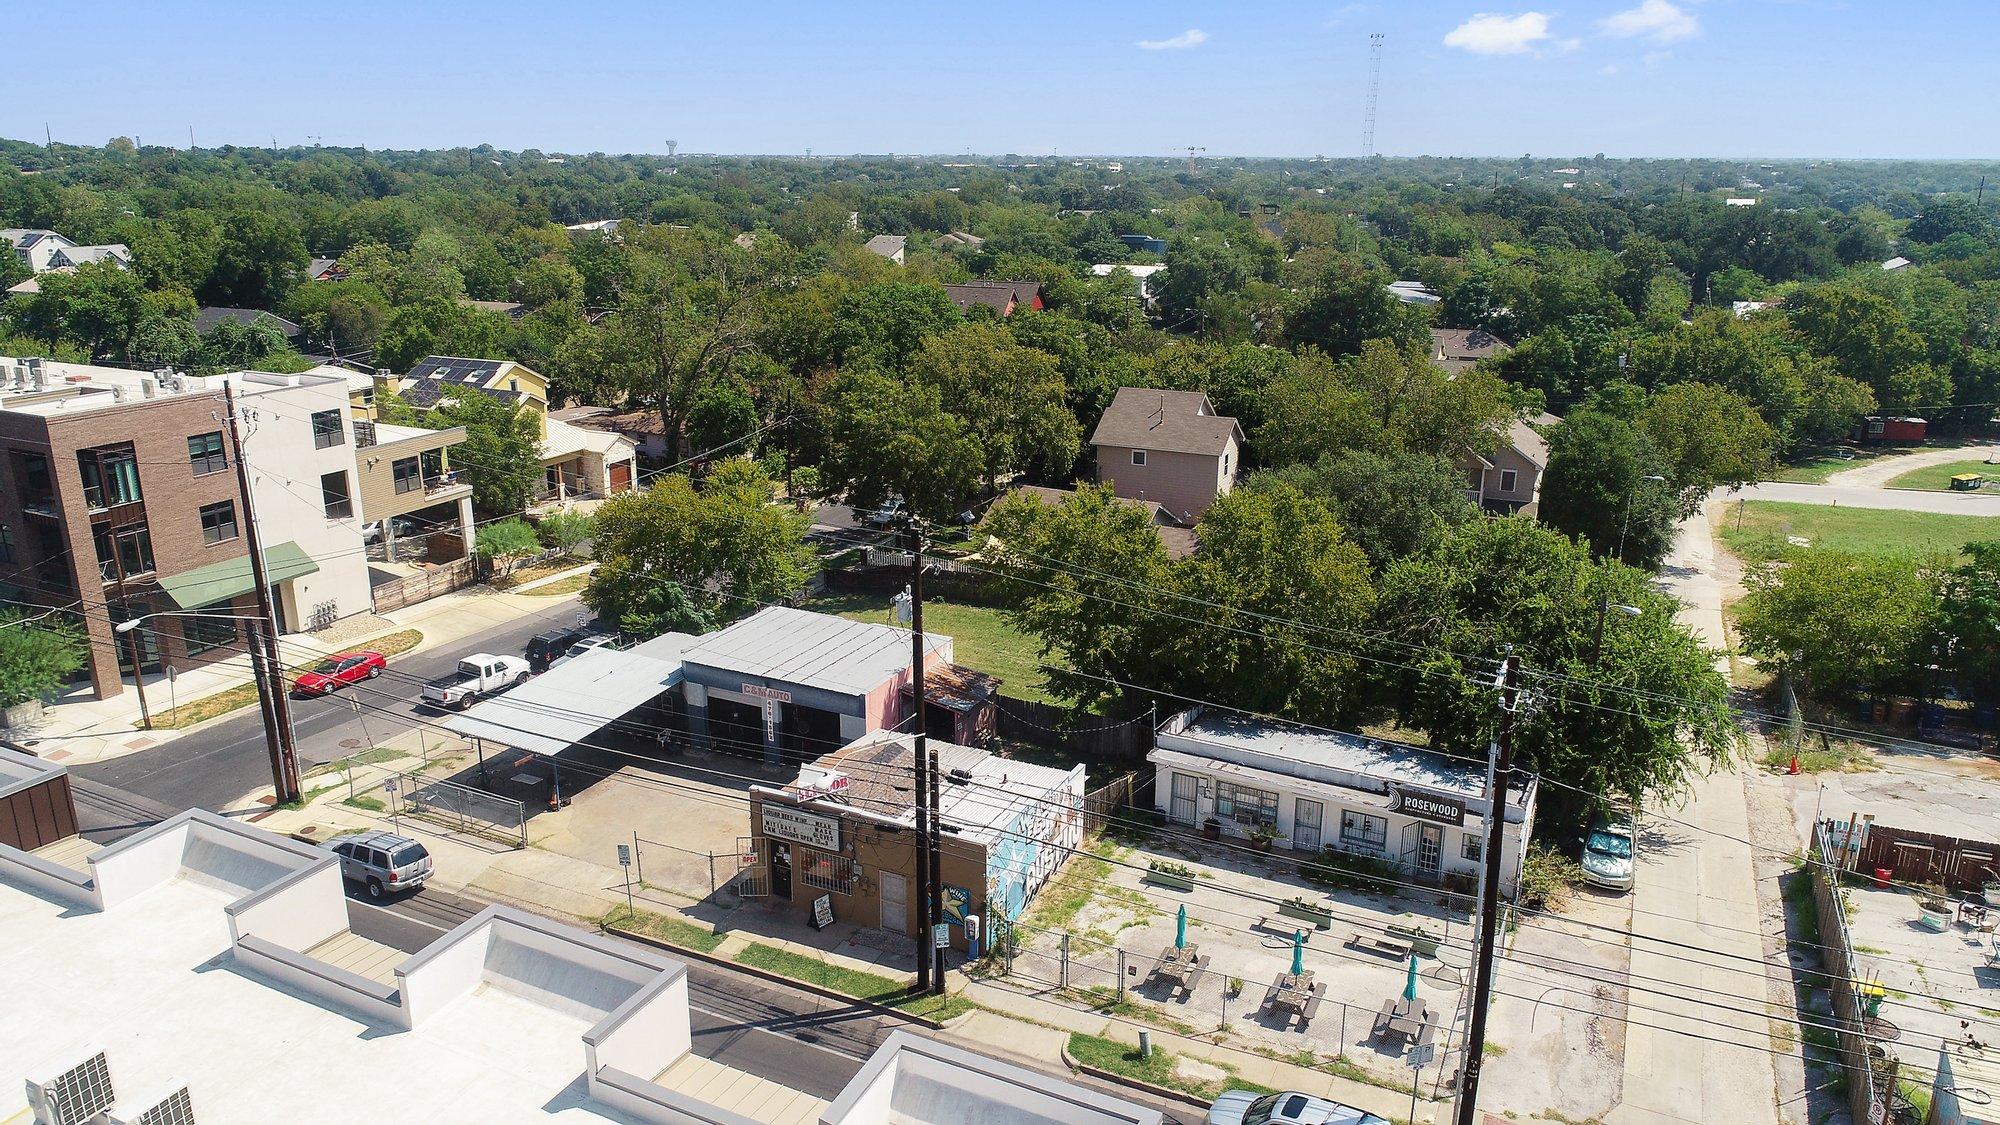 Austin, Texas, United States 1 - 11137528